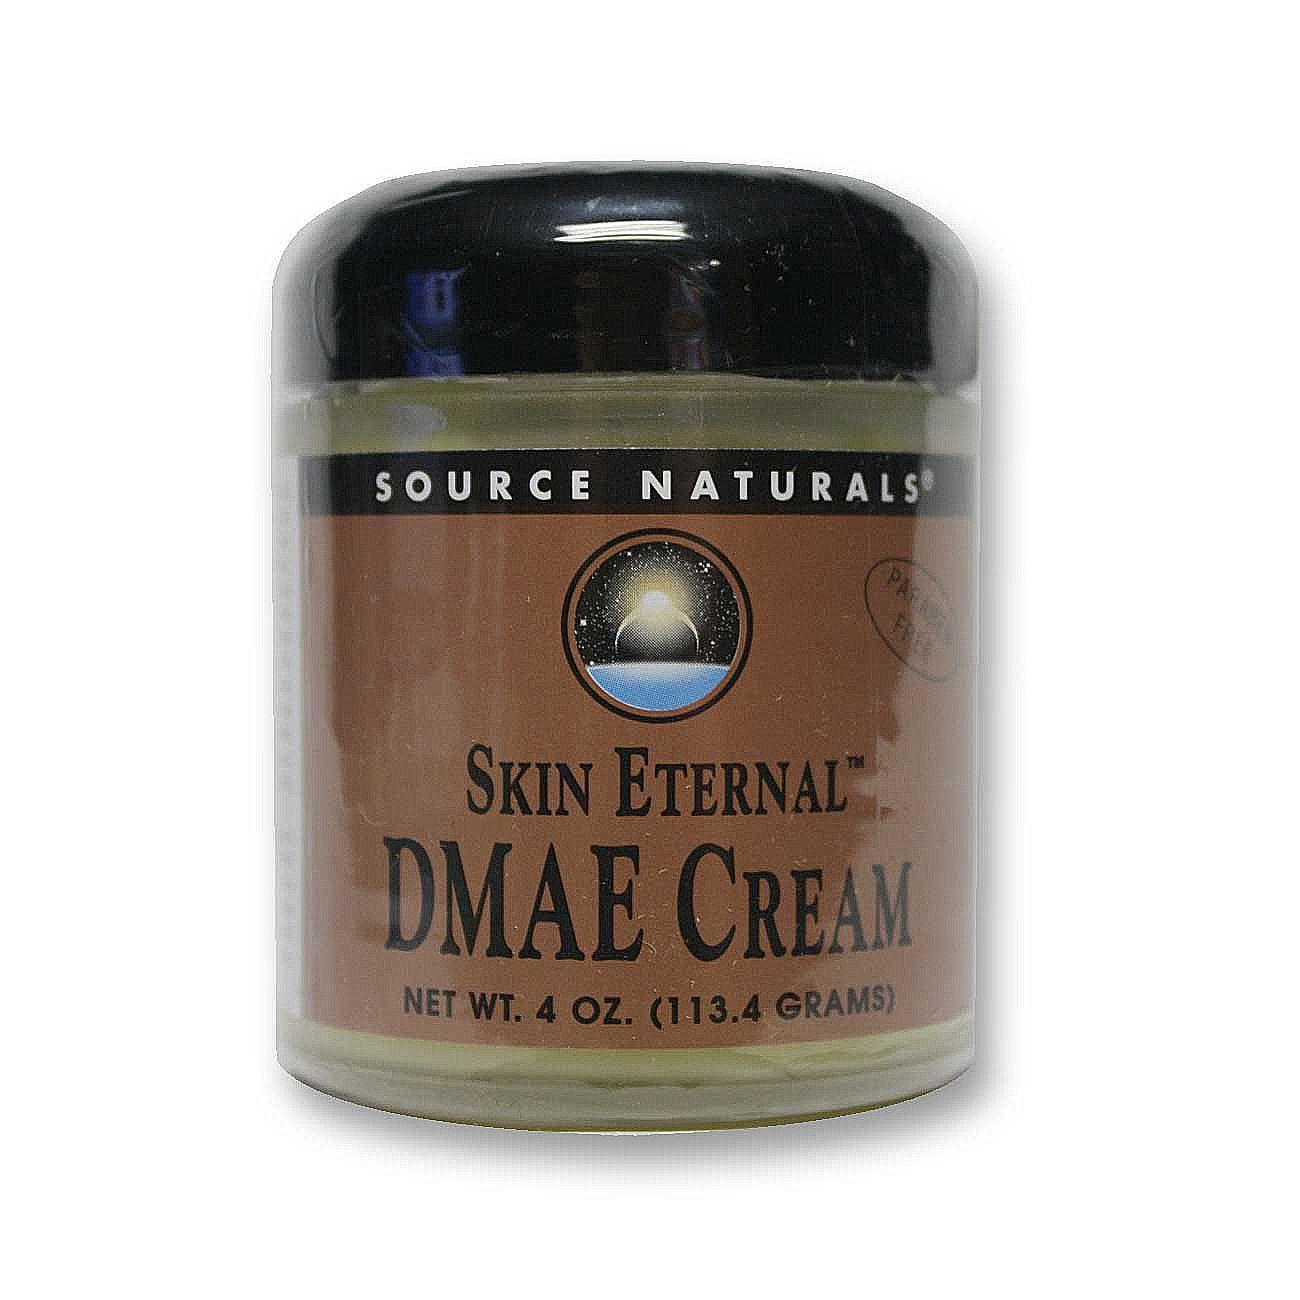 Source Naturals Dmae Cream Review